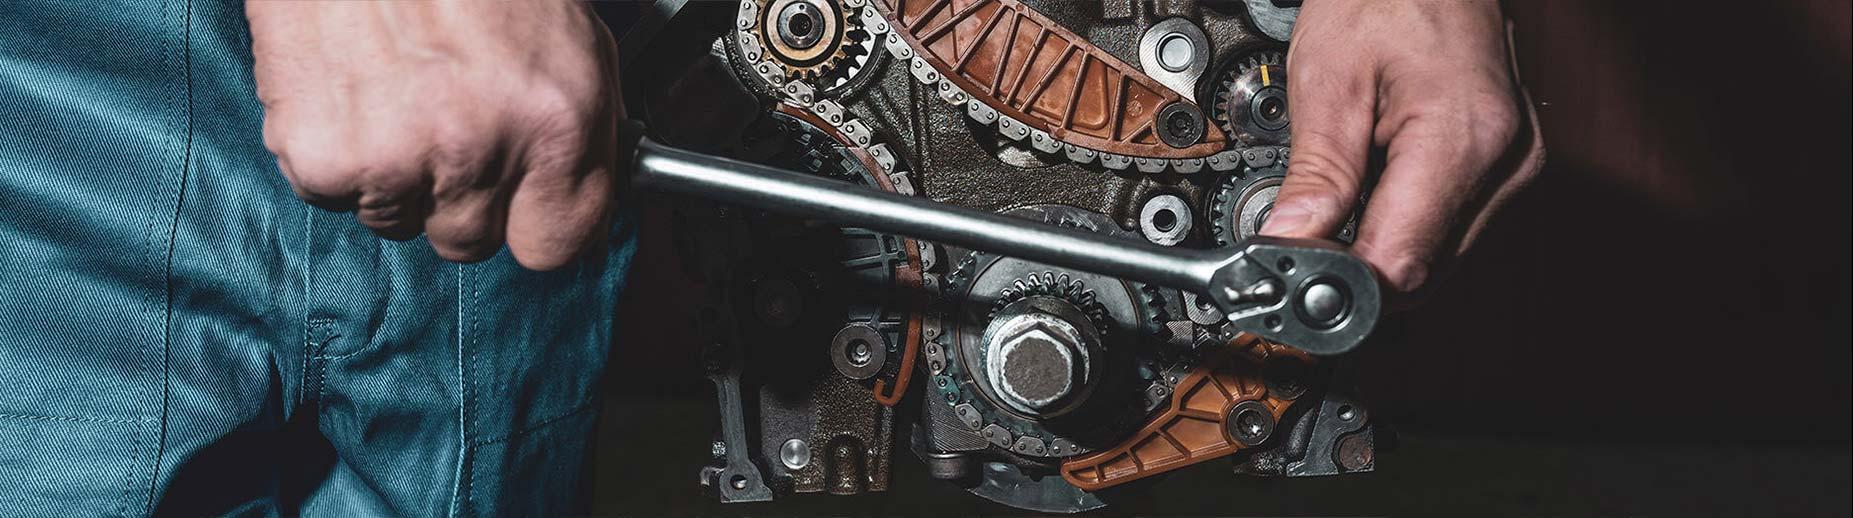 Auto Body Collision Repair, Auto Glass Replacement and Brake Repair